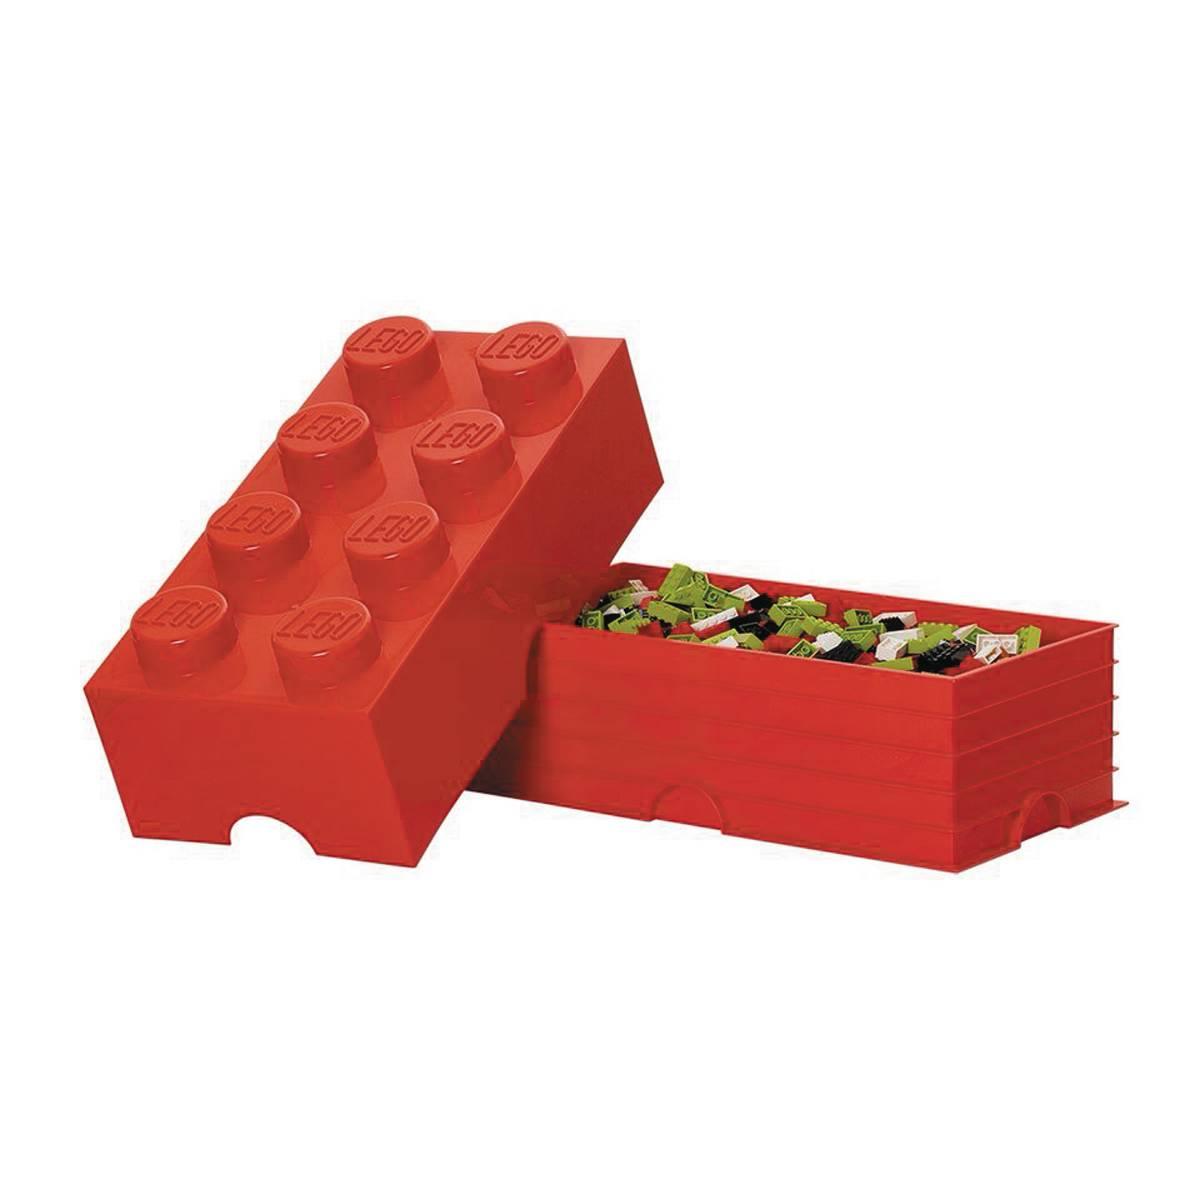 lego storage bricks brian carnell com. Black Bedroom Furniture Sets. Home Design Ideas